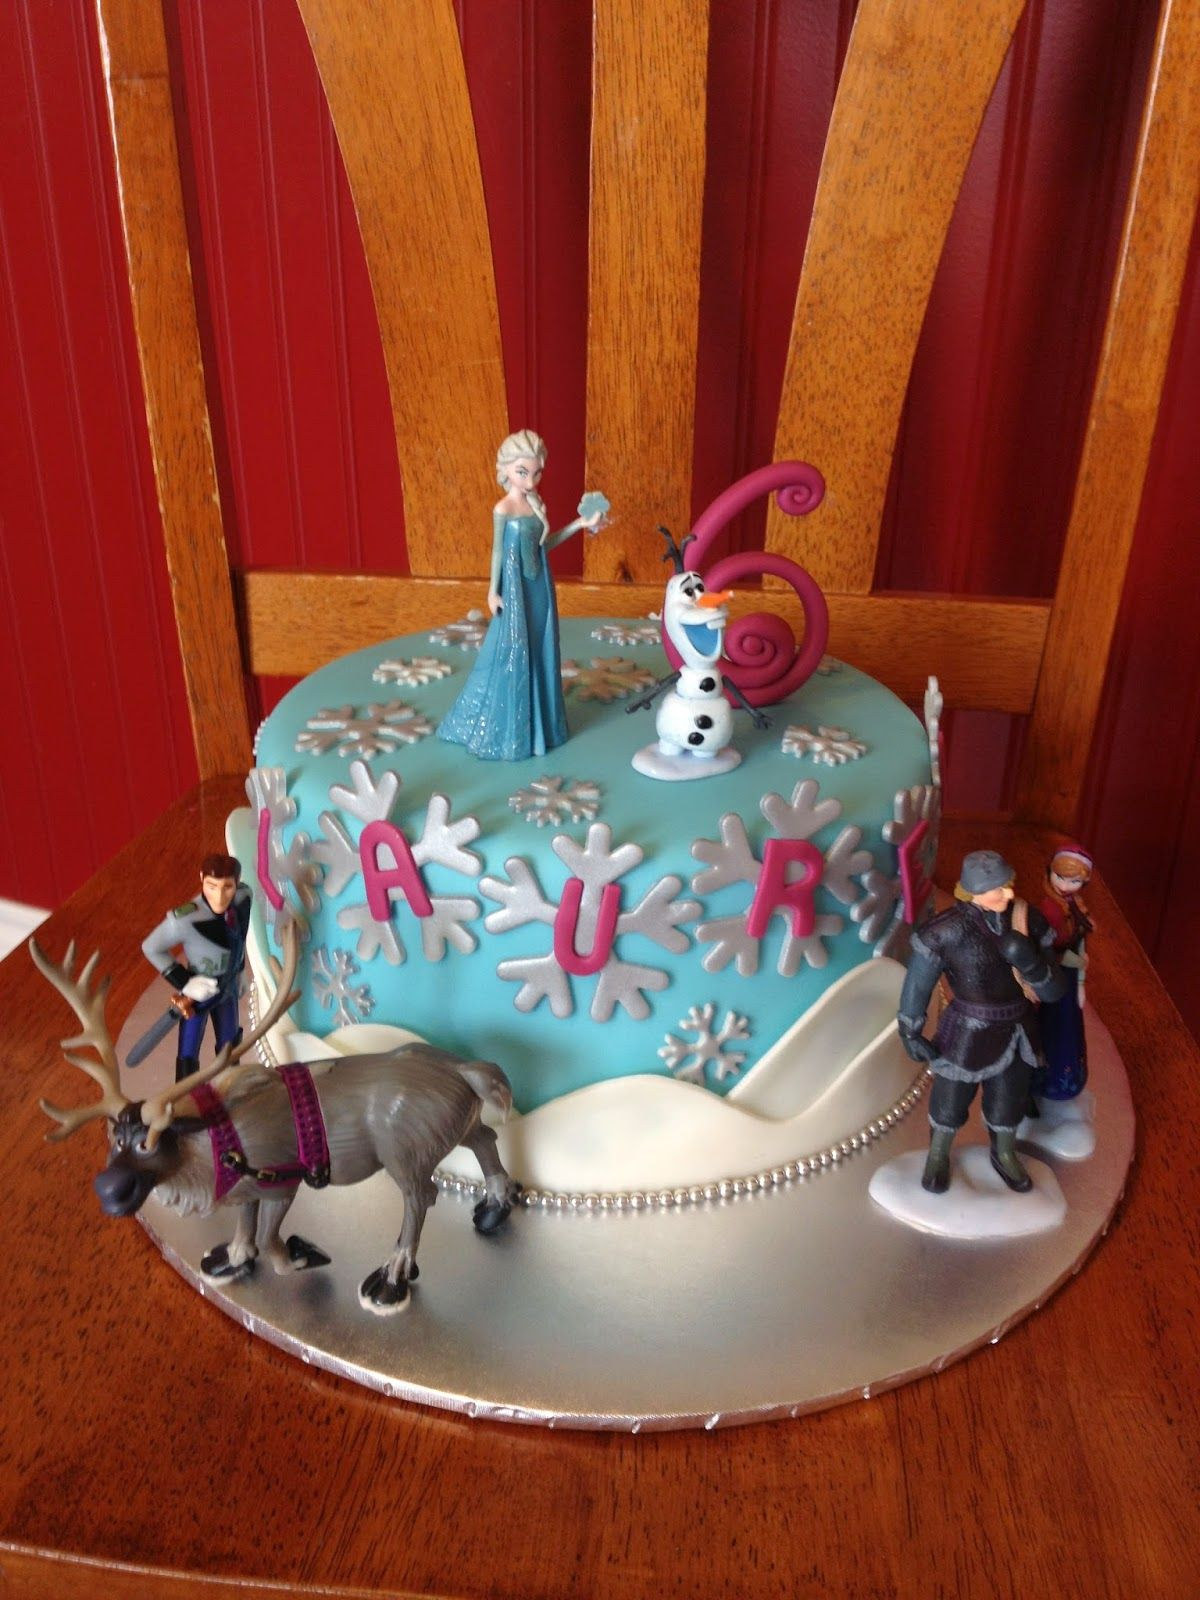 Frozen cake design images  Sugar Love Cake Design Single Tier Frozen cake  cake covering and